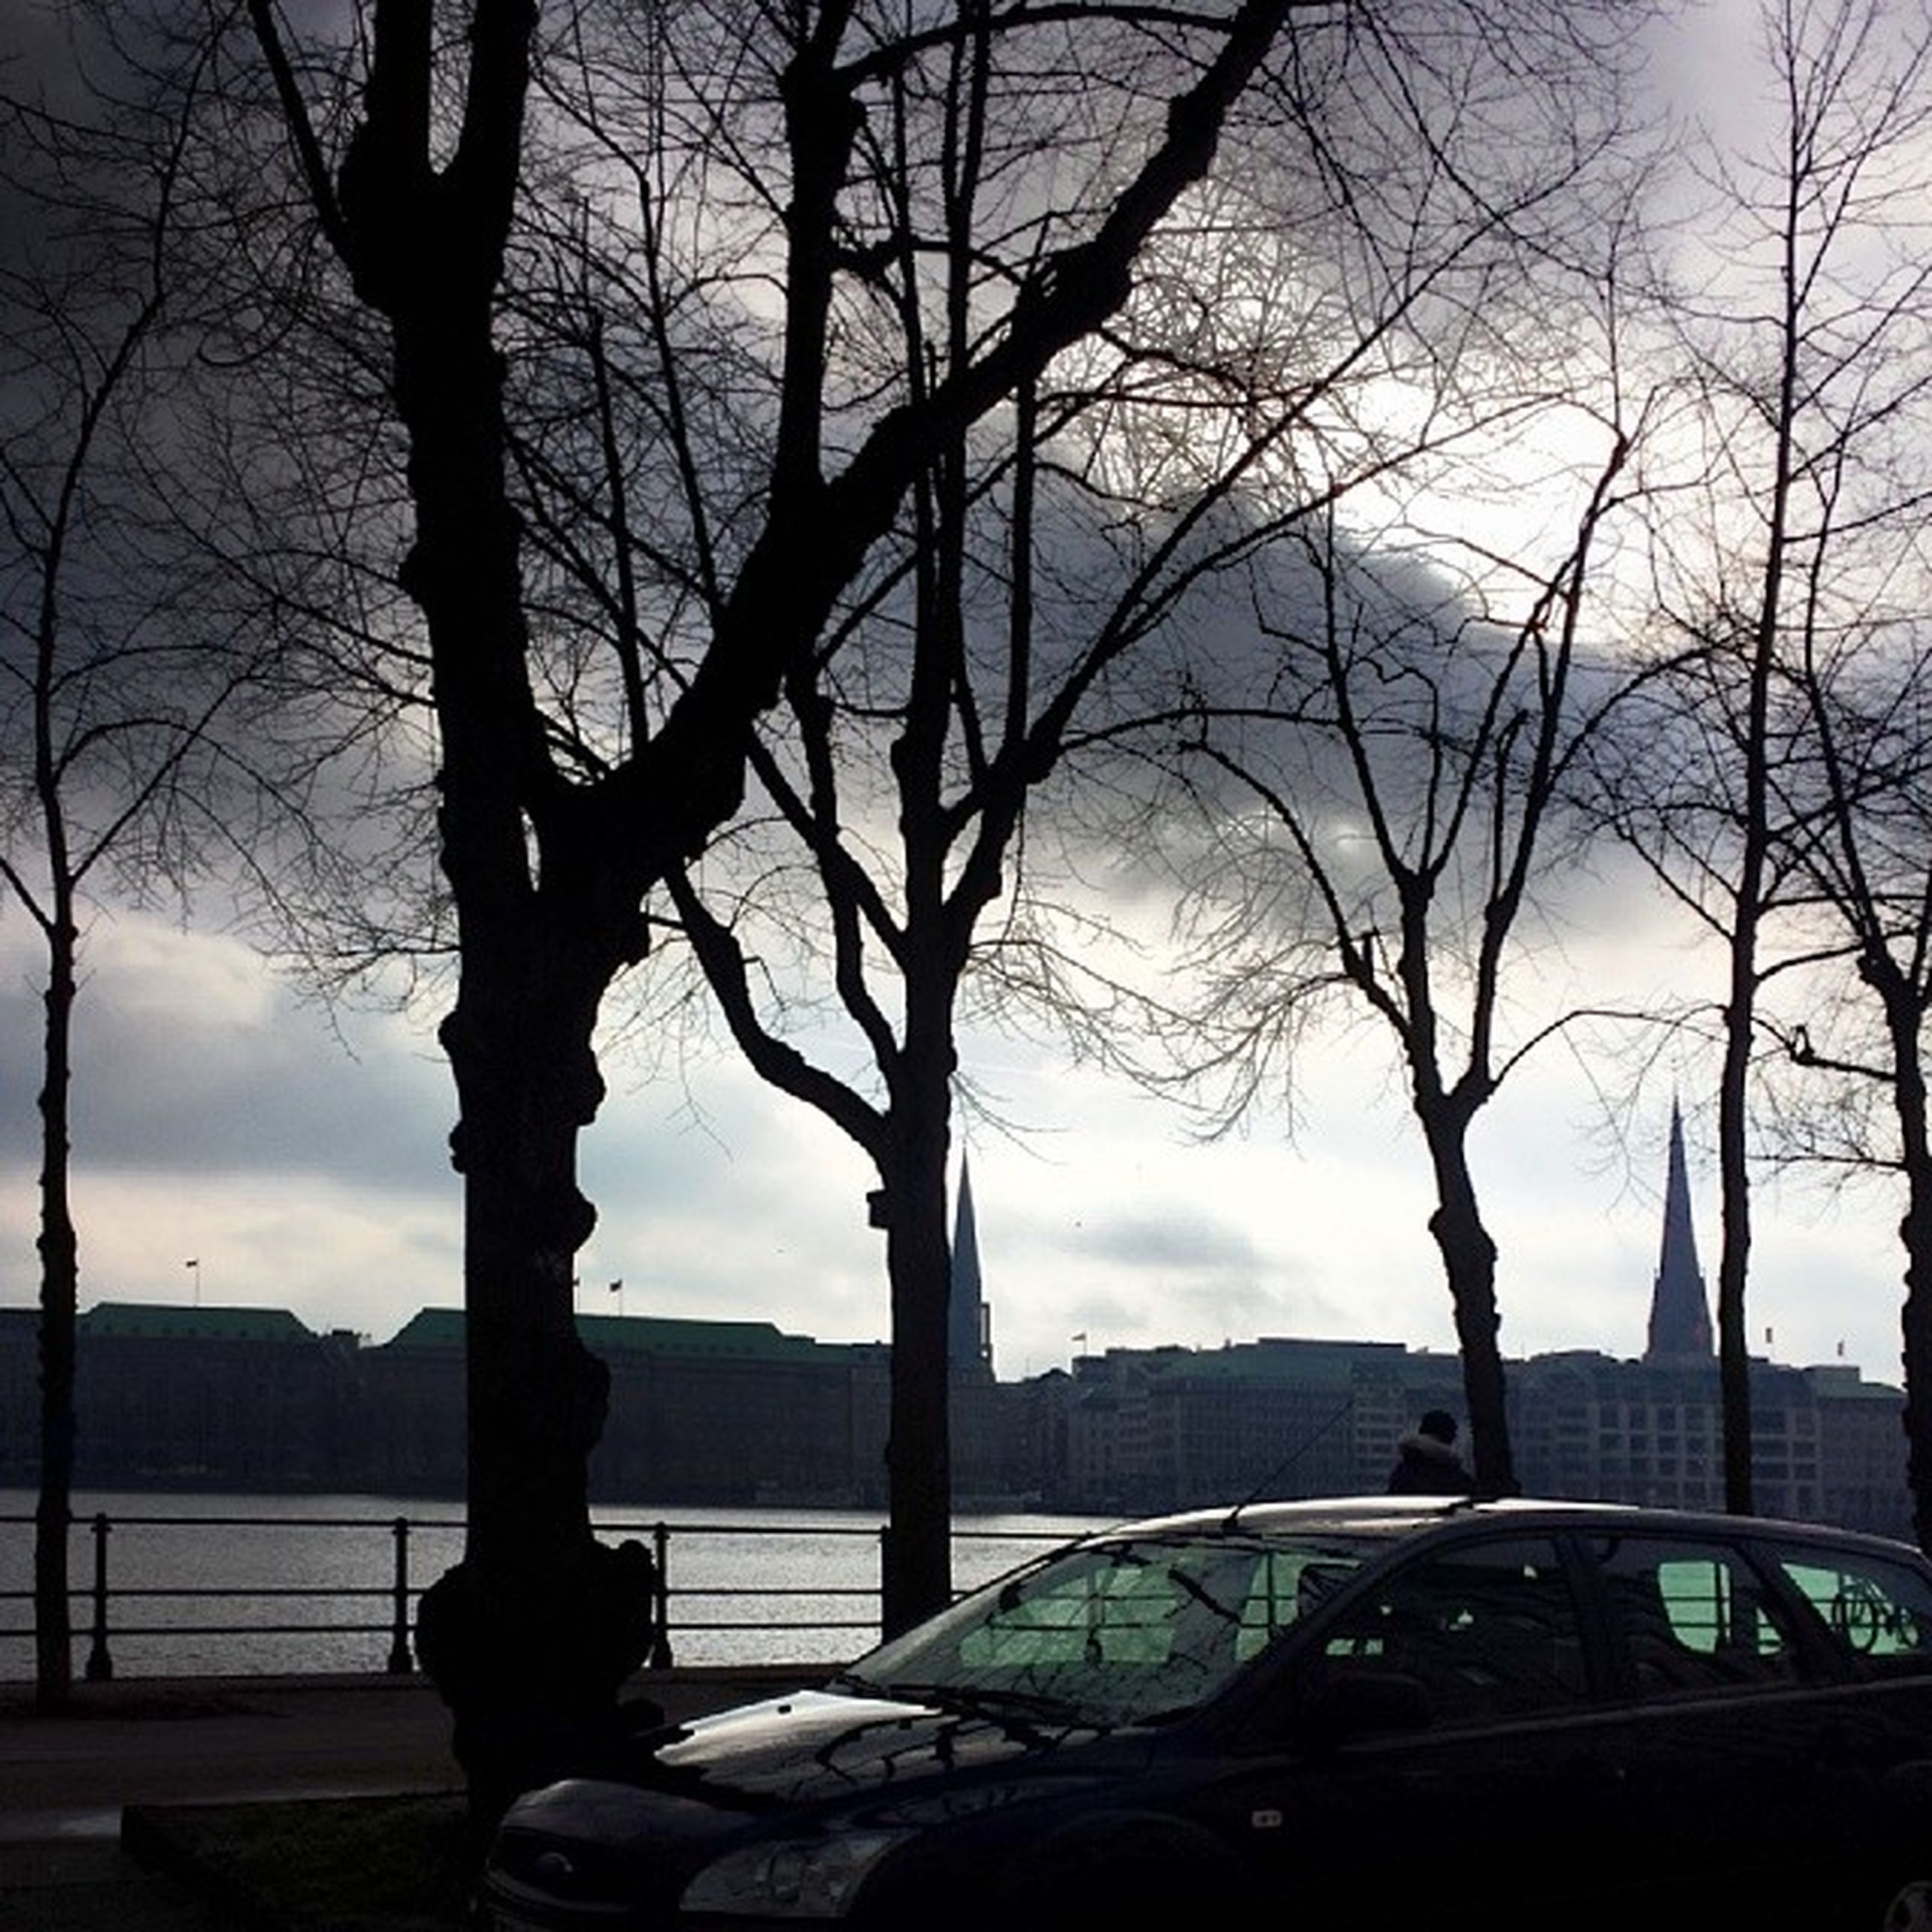 tree, sky, bare tree, railing, built structure, city, architecture, silhouette, branch, building exterior, transportation, cloud - sky, river, water, bridge - man made structure, land vehicle, cloud, nature